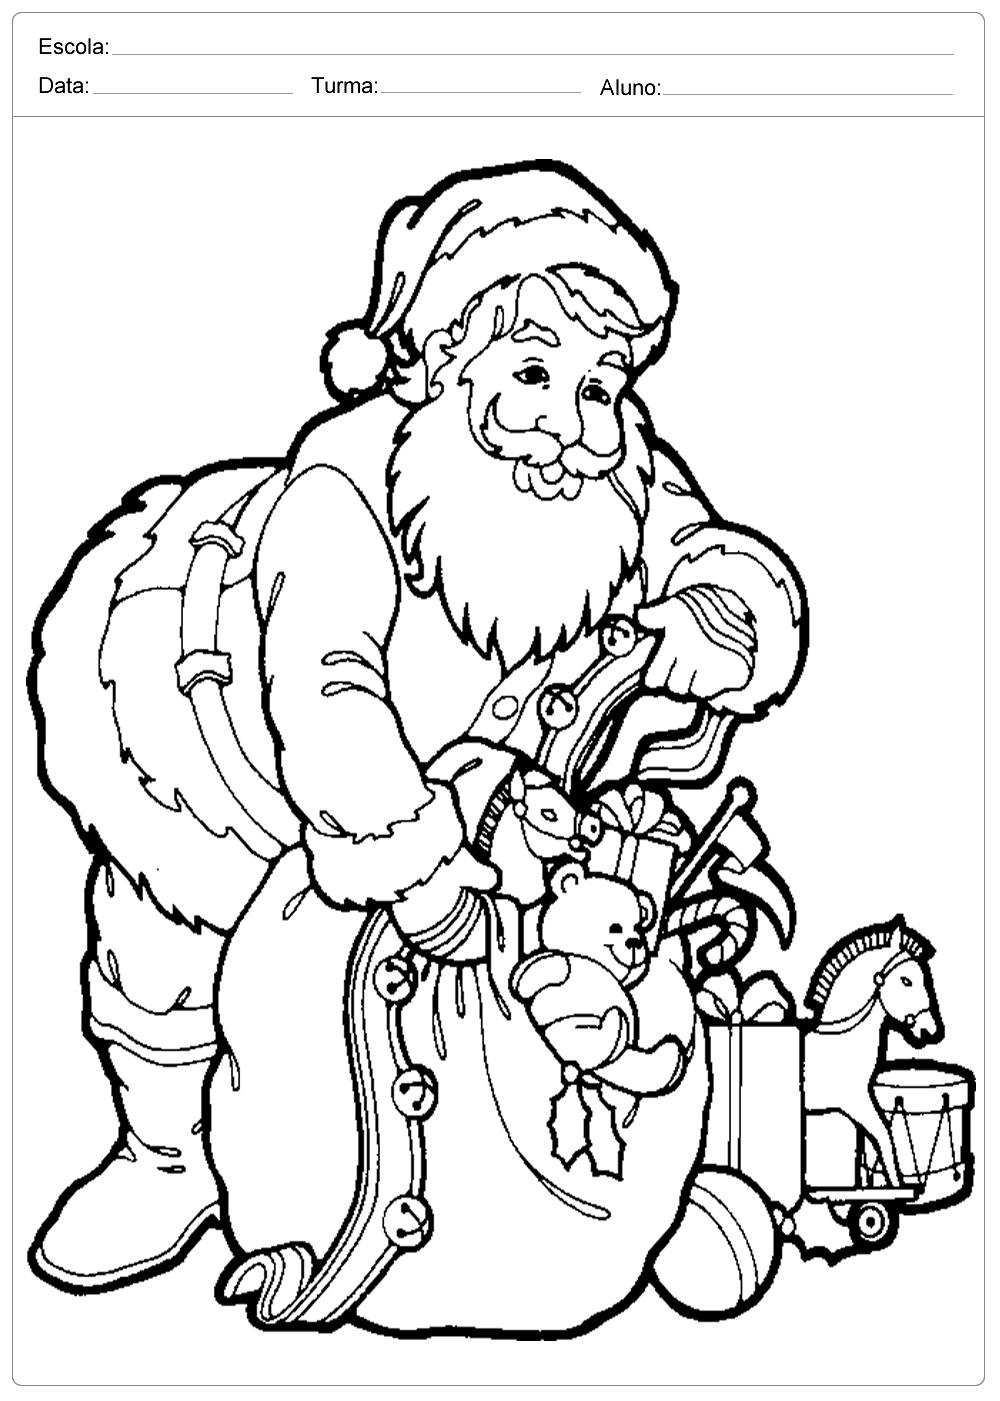 Colorir desenhos de natal online dating 6